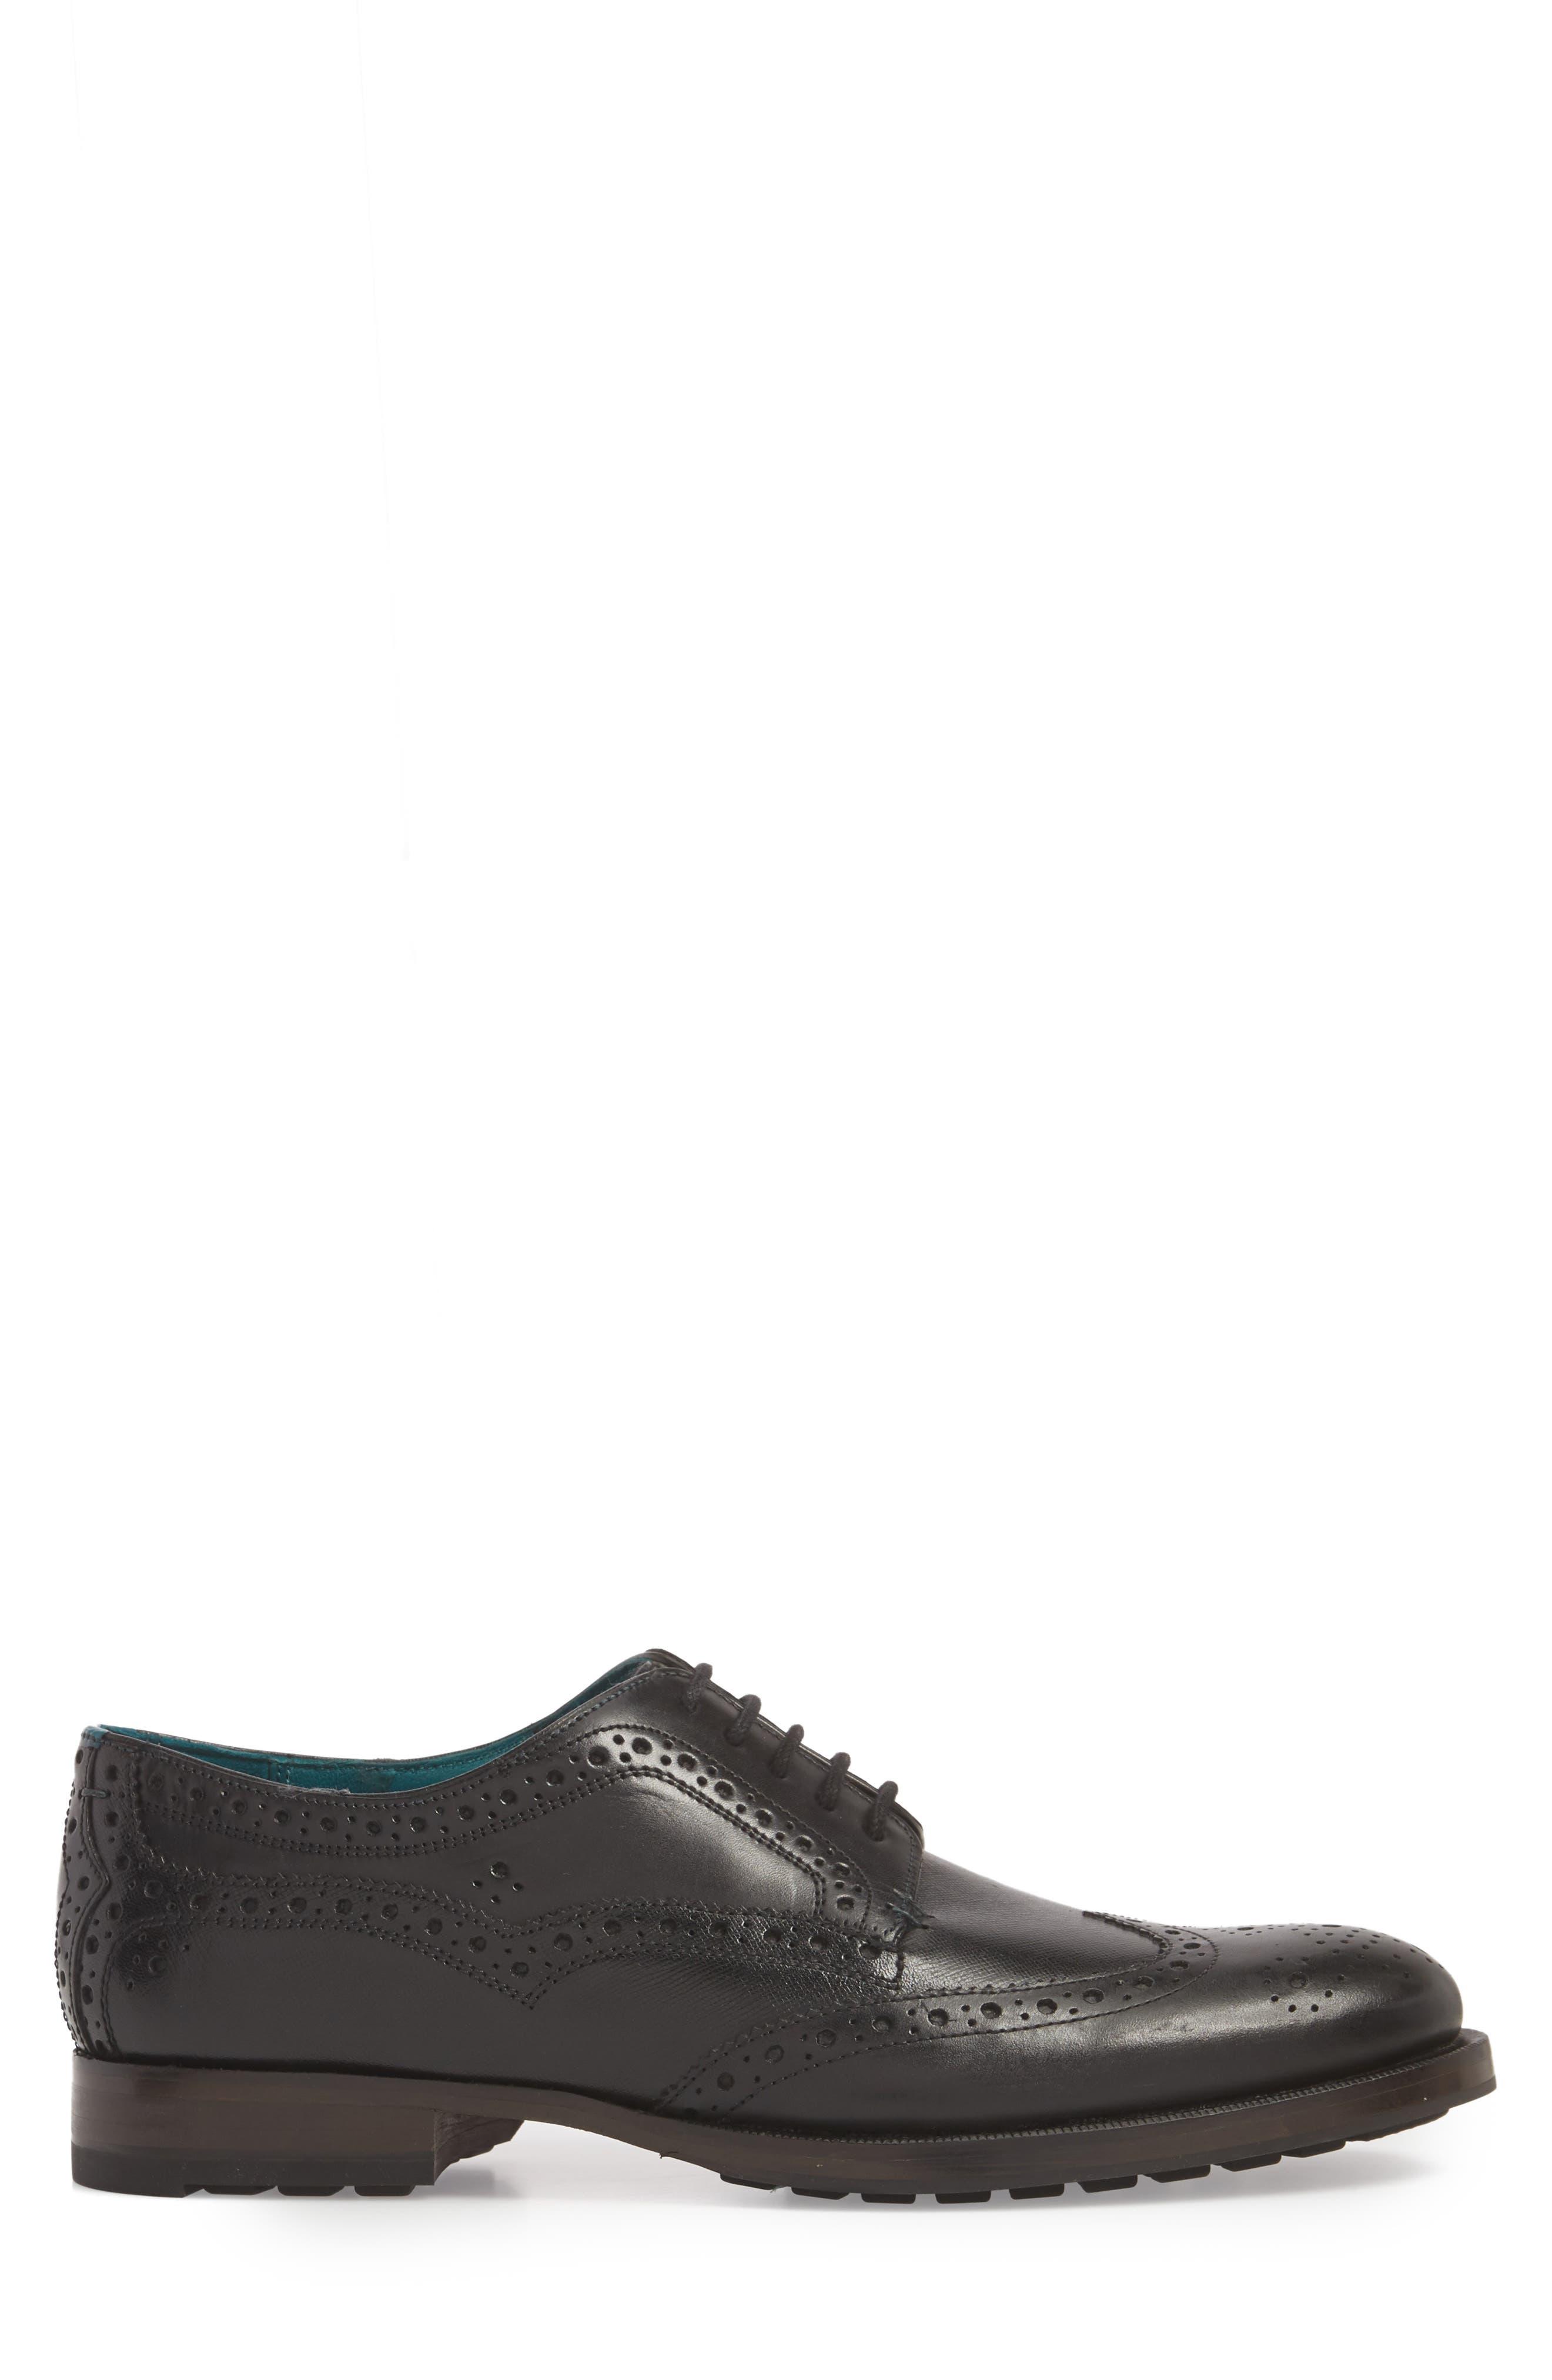 Senape Wingtip,                             Alternate thumbnail 5, color,                             Black Leather